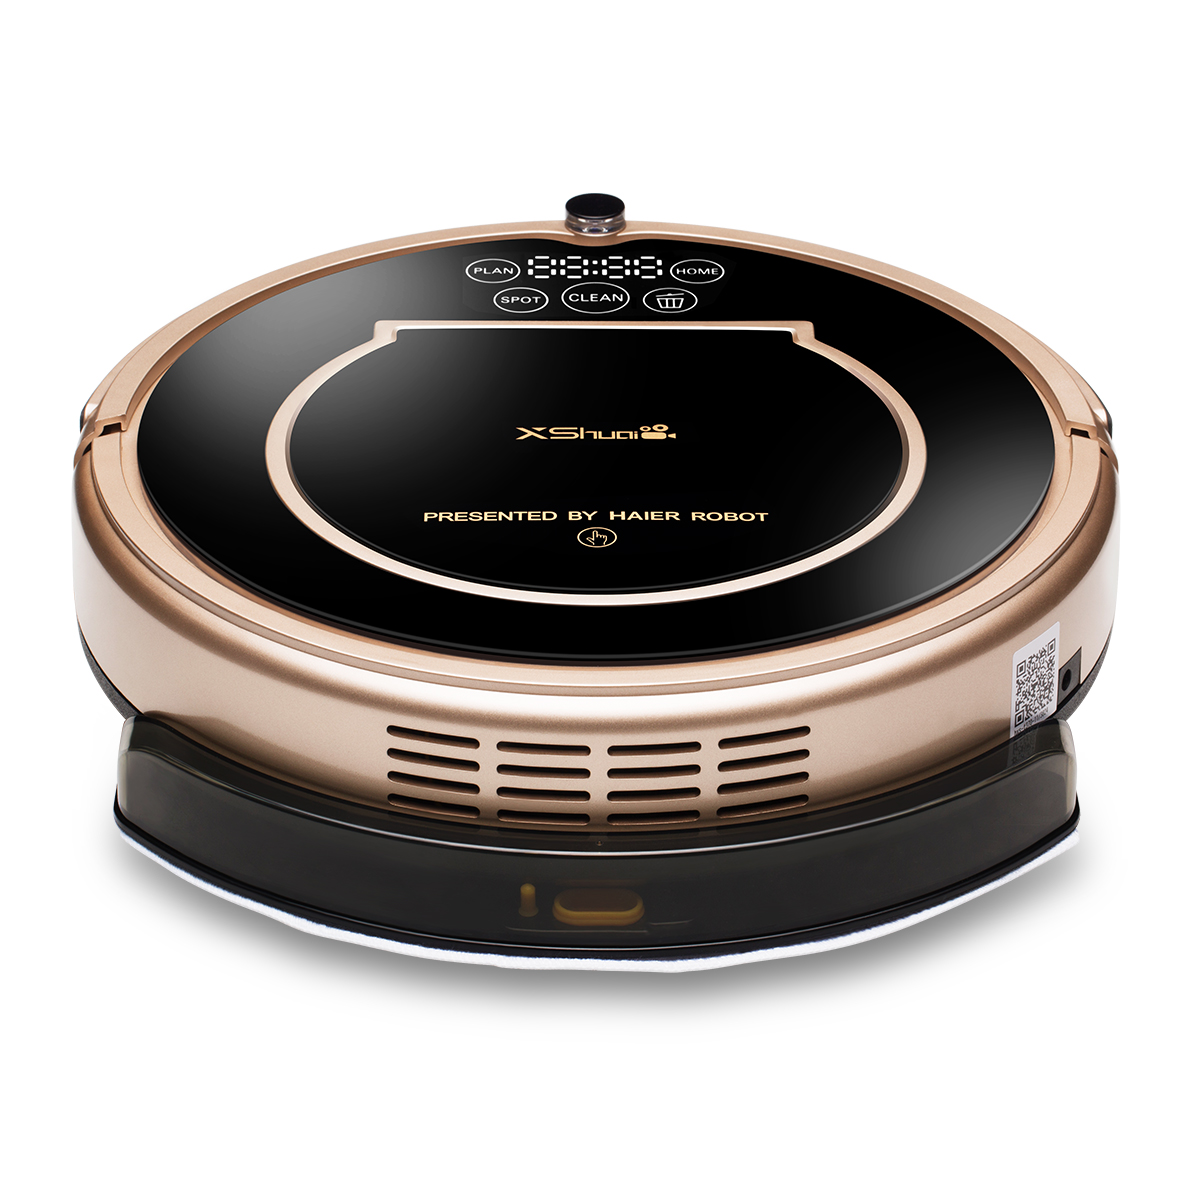 Haier XShuai Robotic Vacuum Cleaner, Alexa Voice Control ...